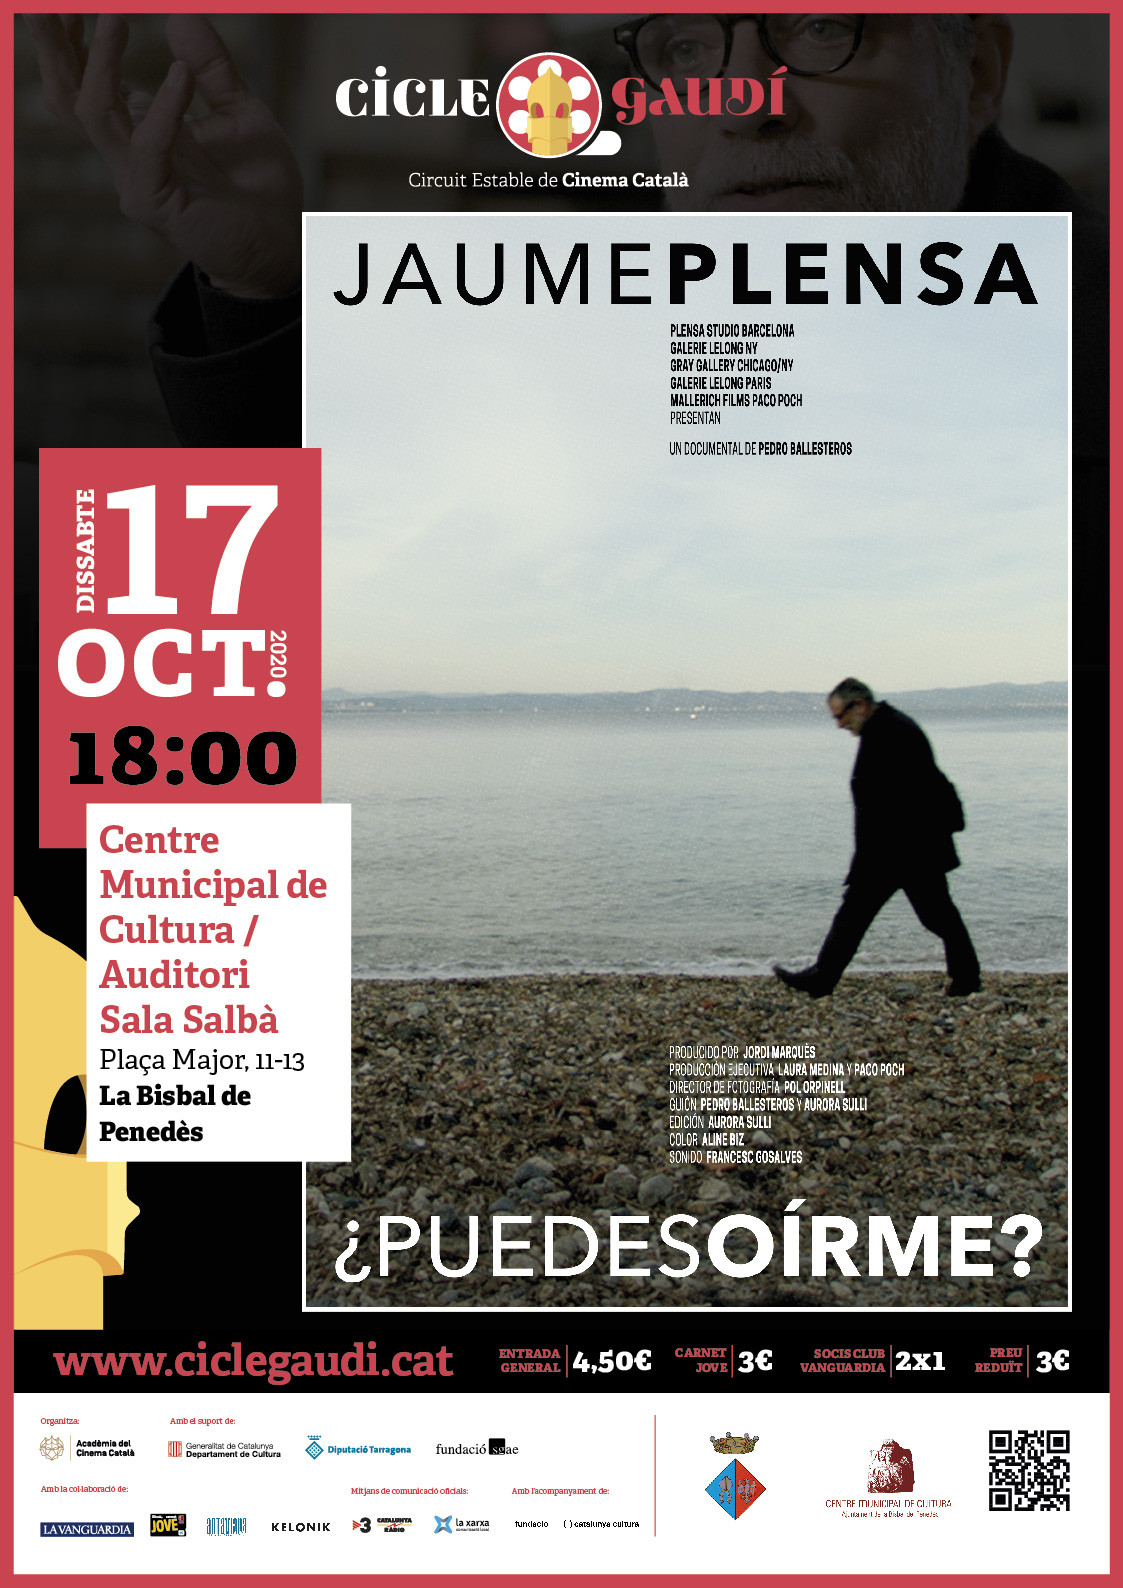 Cicle Gaudí: Avui dissabte a les 18h projecció del documental ¿Puedes oírme? al CMC